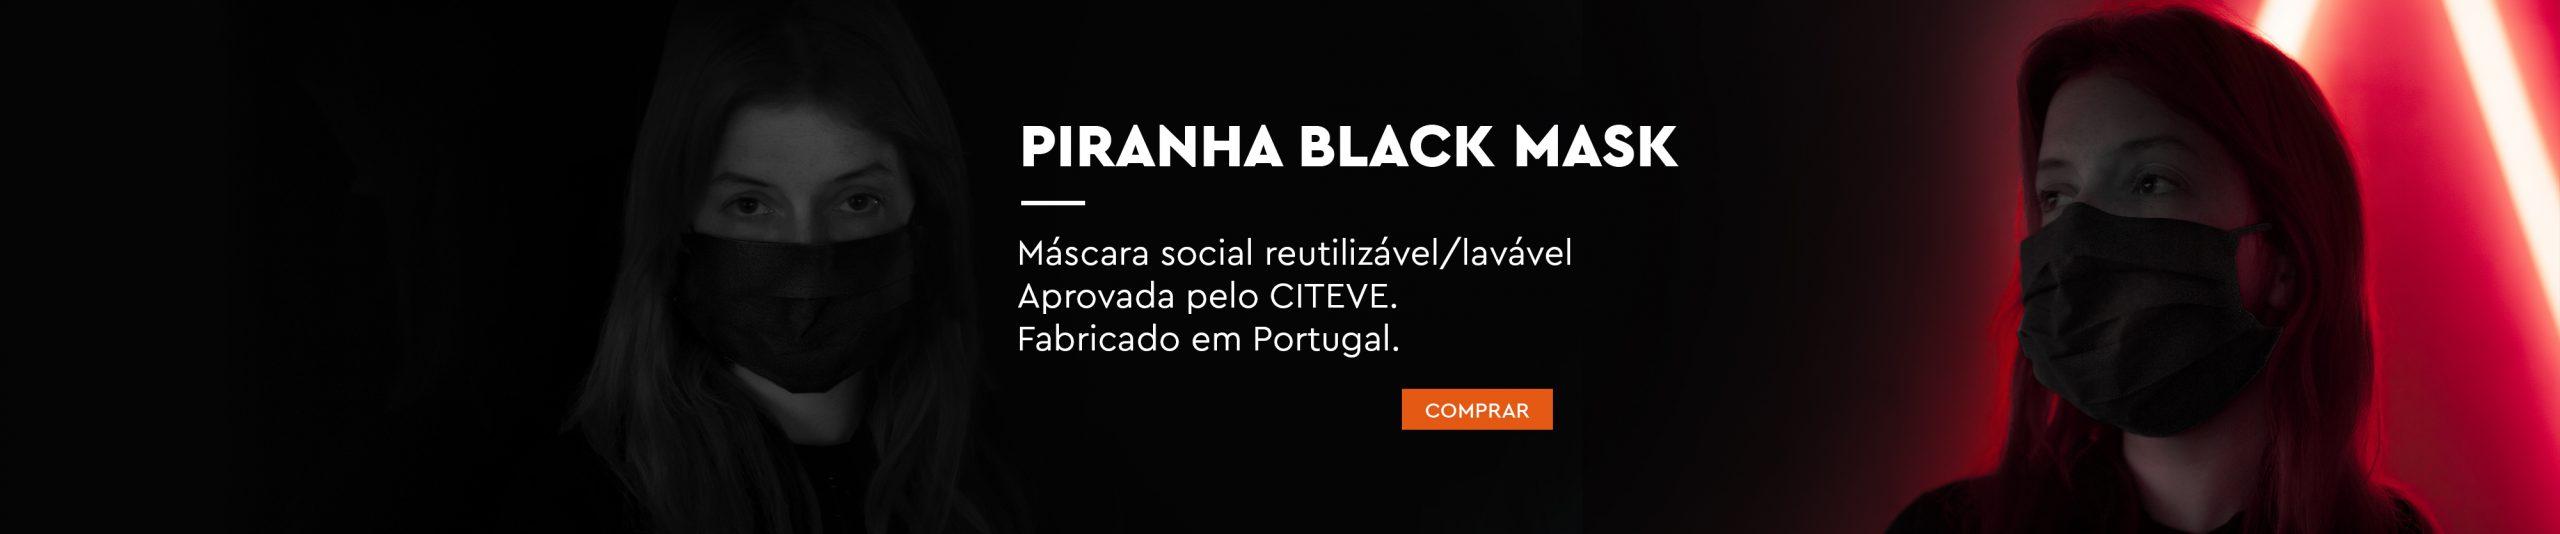 Piranha Black Mask